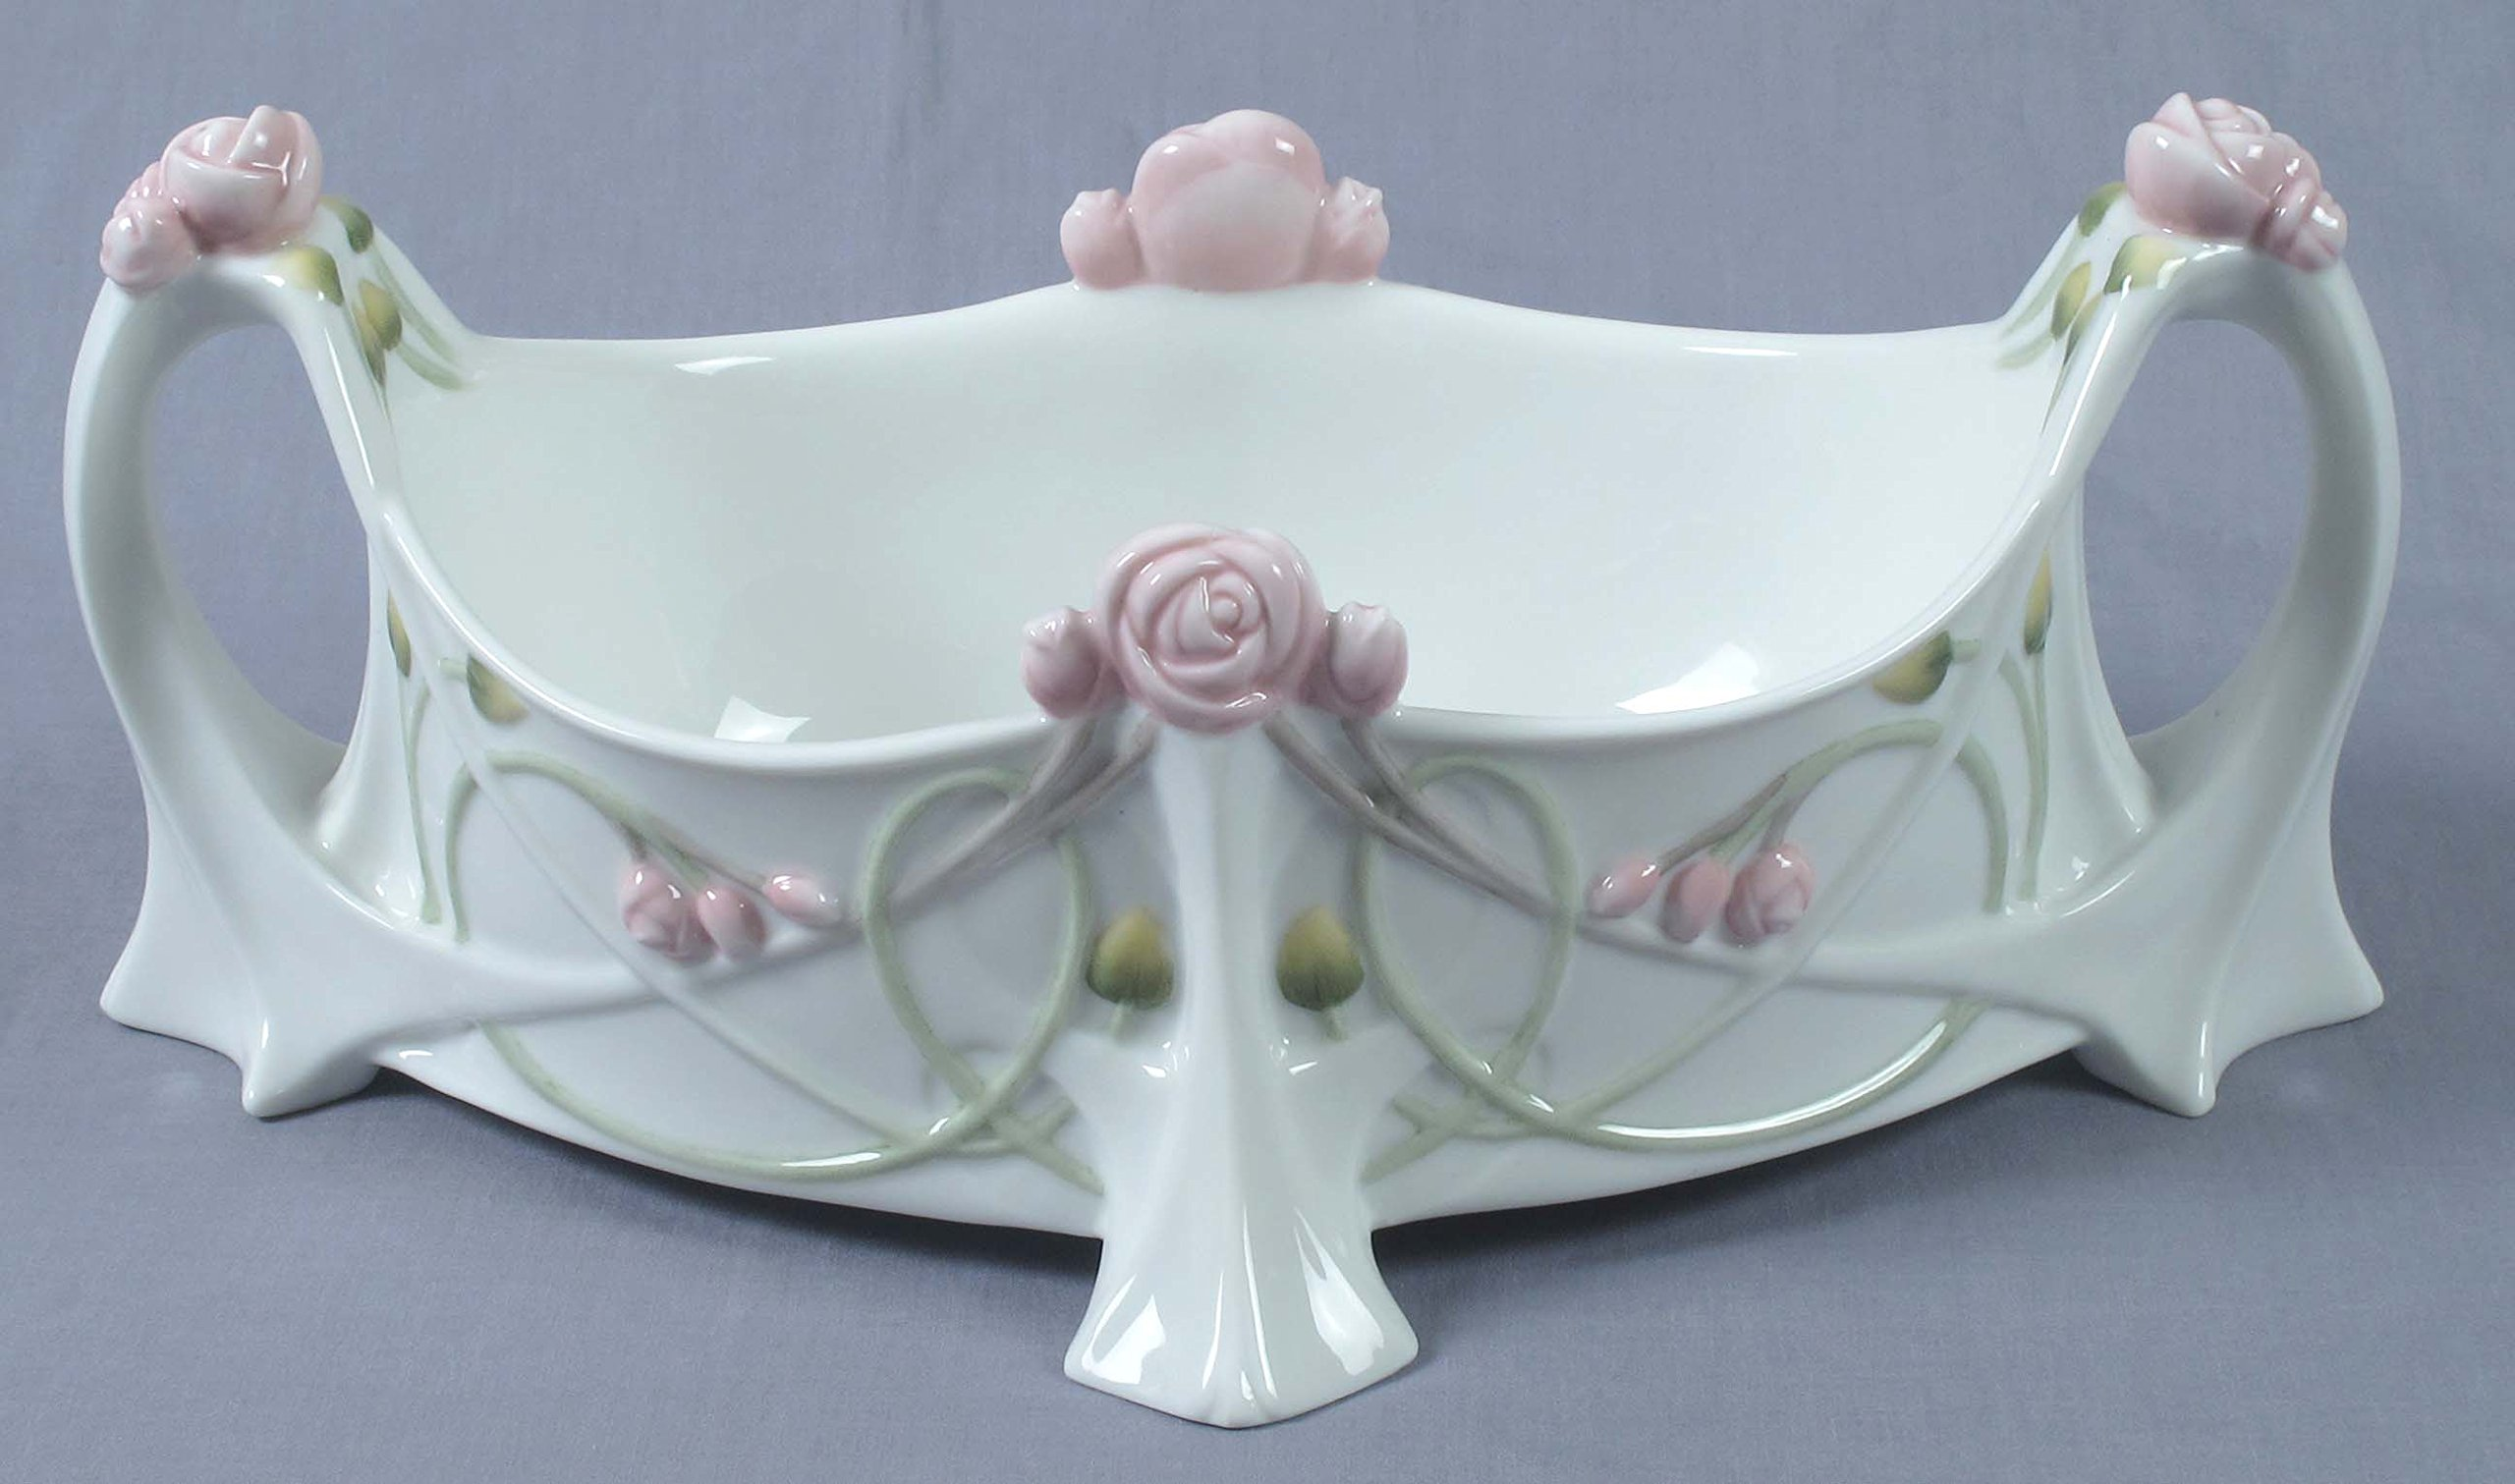 Unicorn Studios AP20315AA White Porcelain Tea Bag Caddy with Roses Stems Leaves by Unicorn Studios